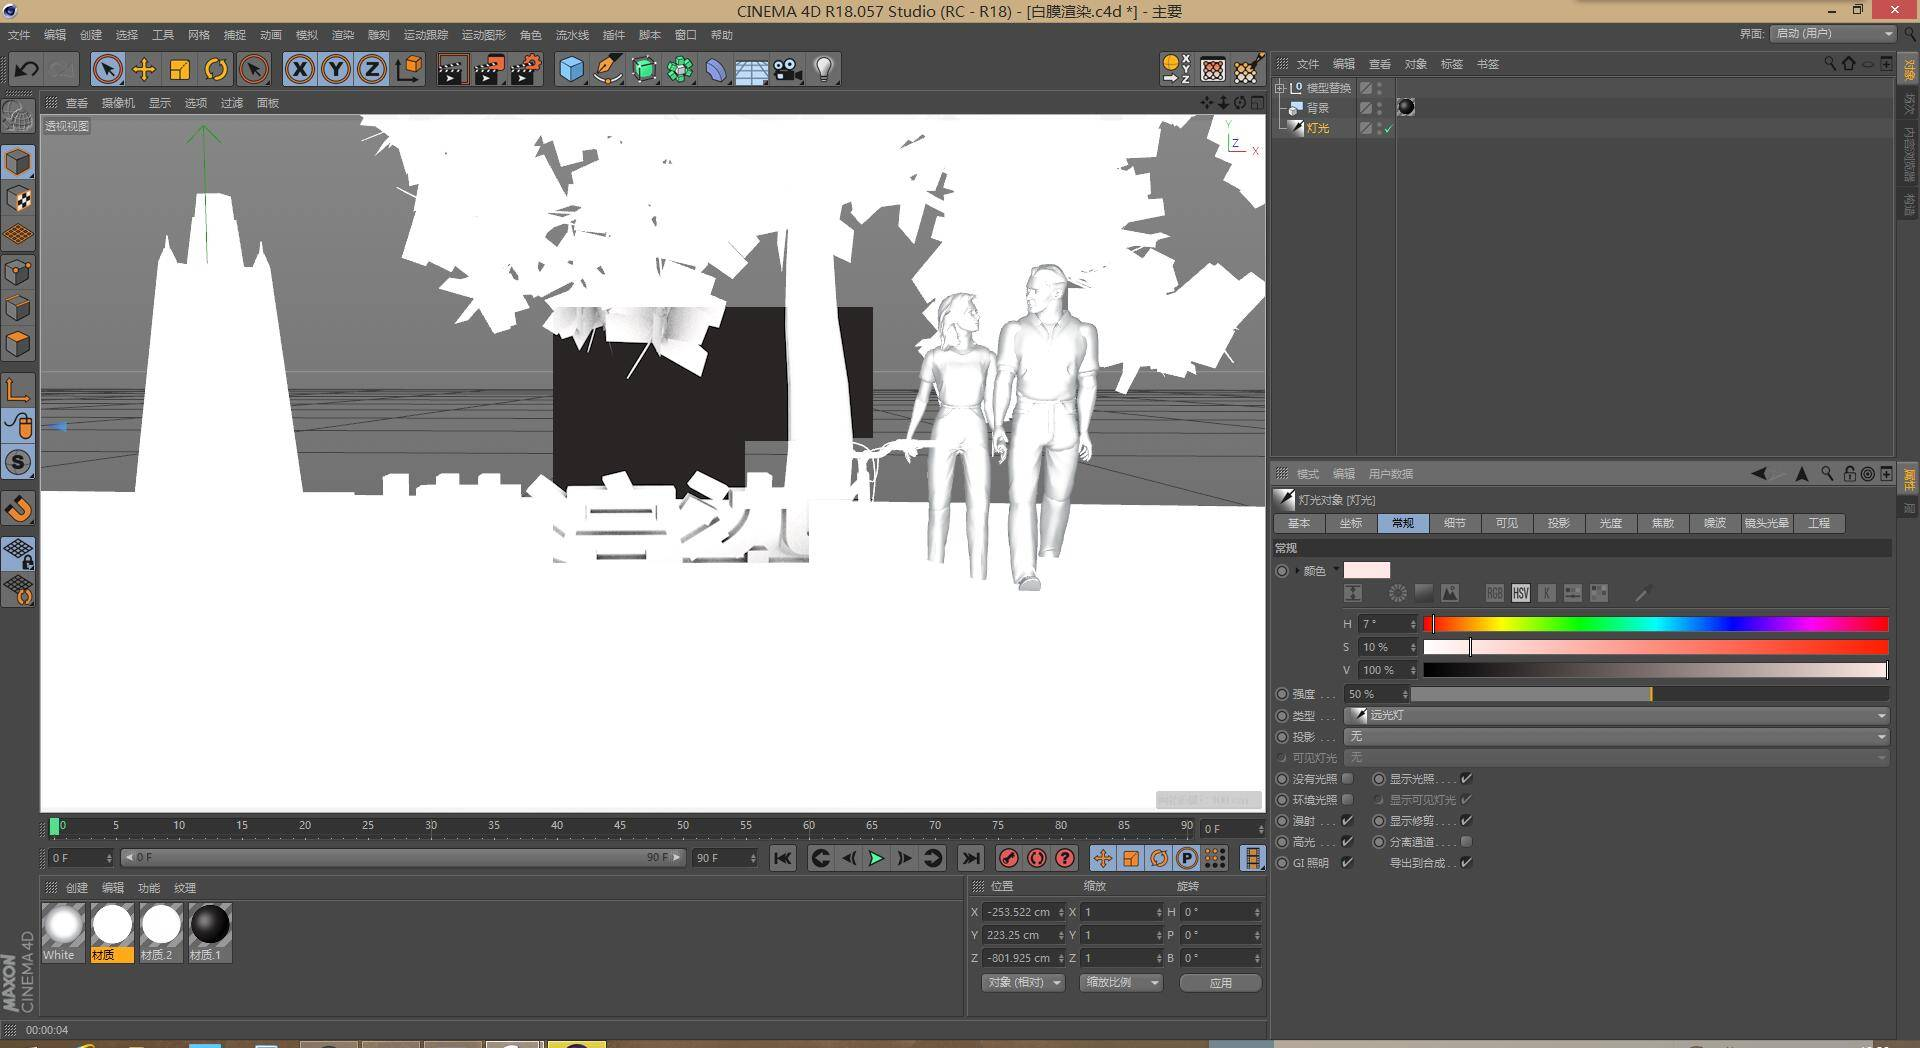 CINEMA 4D 入门 (22):C4D 白模渲染 附:工程文件 - R 站|学习使我快乐! - 4